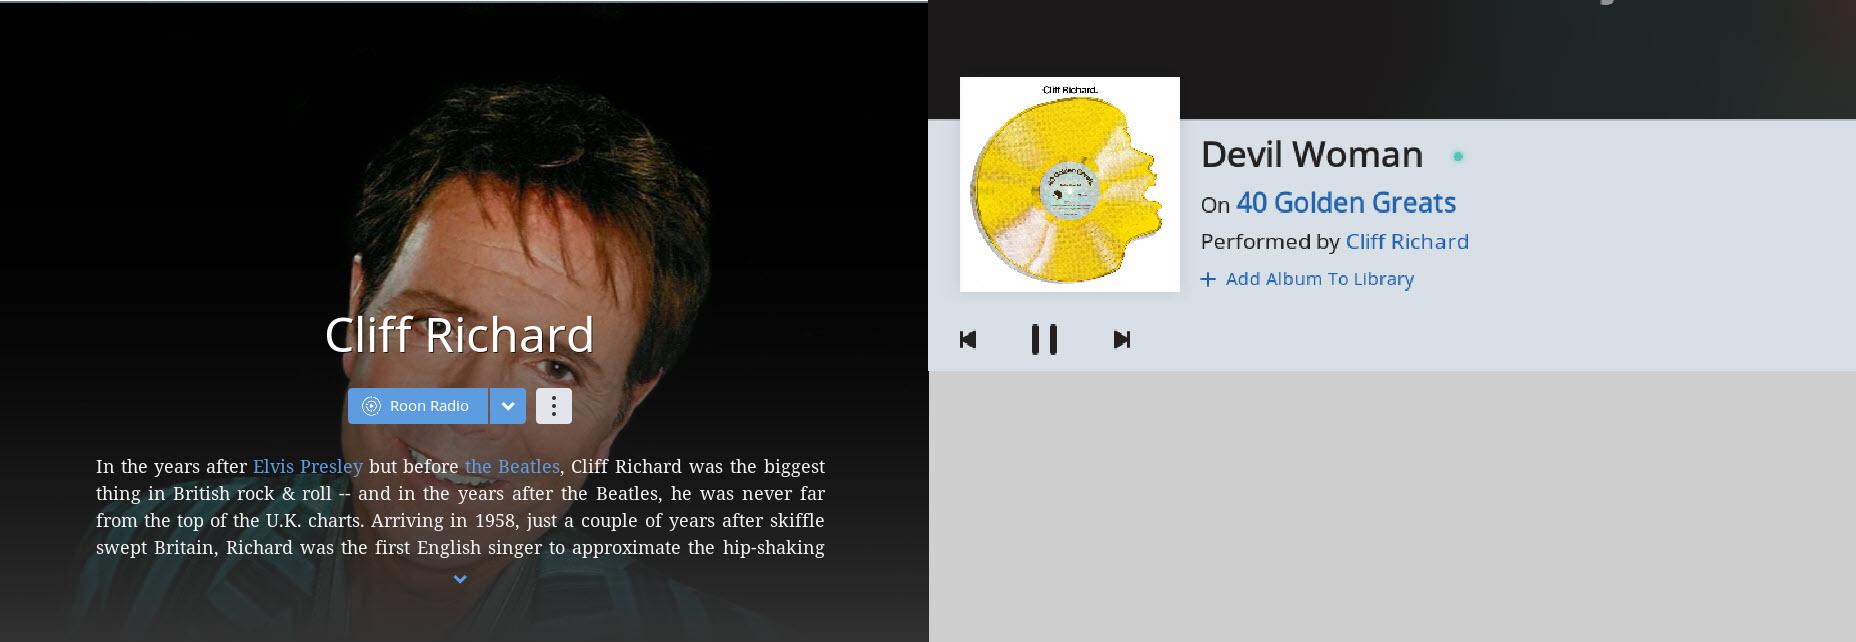 Cliff Richard Devil Woman.jpg